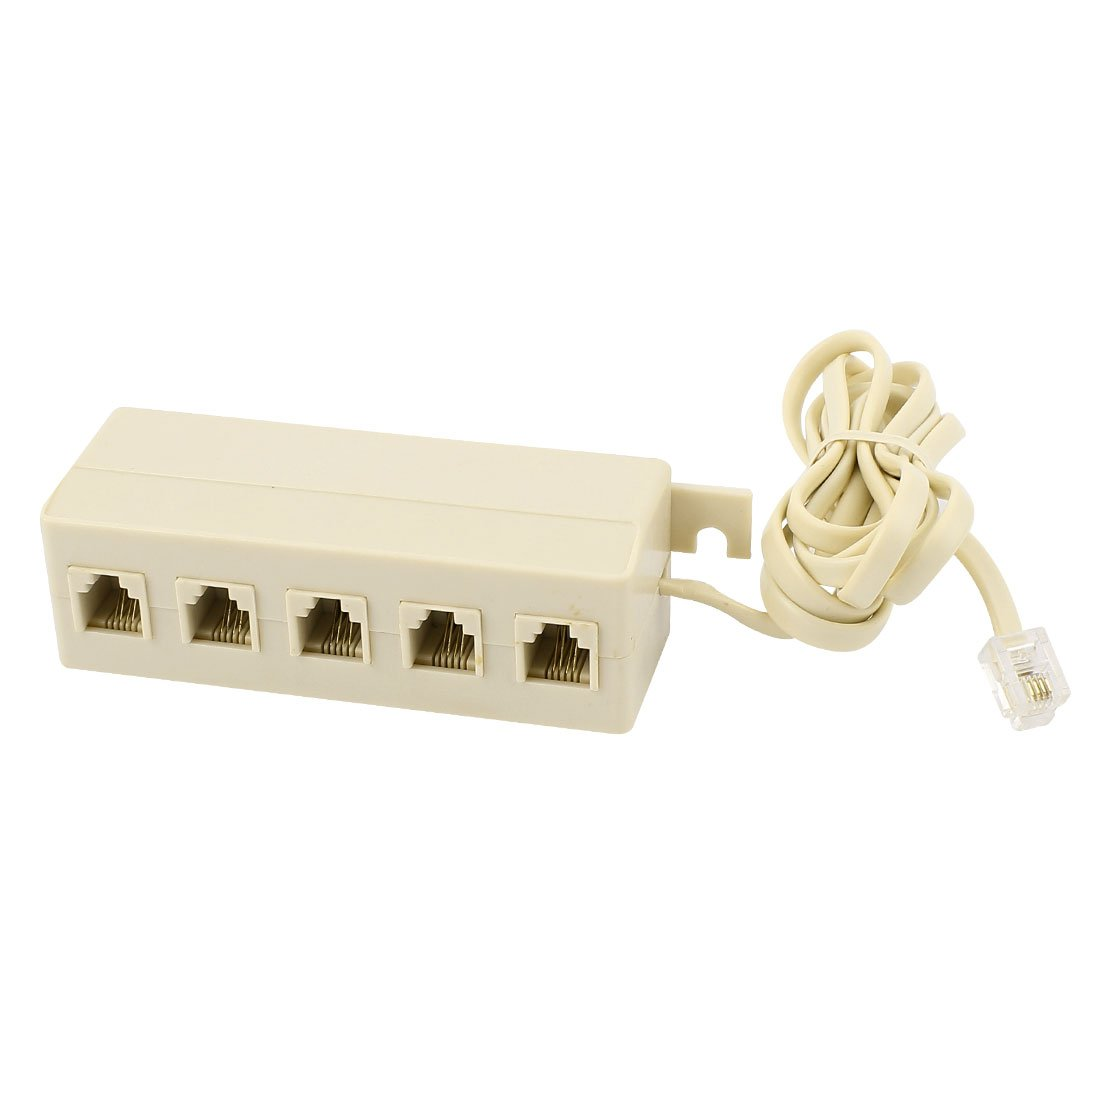 uxcell 5 Way Outlet 6P4C RJ11 Telephone Phone Modular Jack Line Splitter Adapter Beige a15040800ux0490